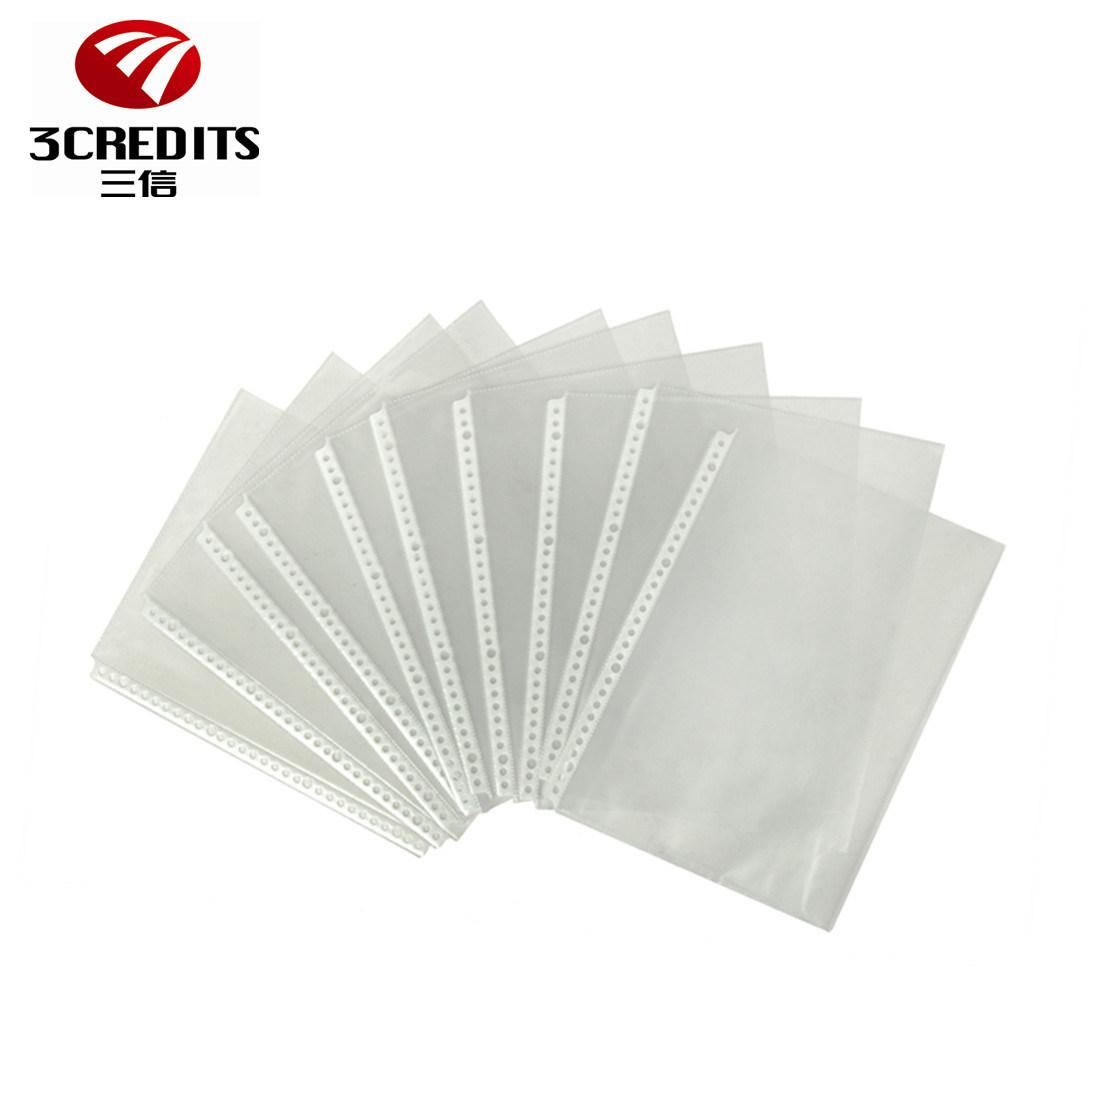 China Pp 30 Holes A4 Sheet Protector Document Bag Photos